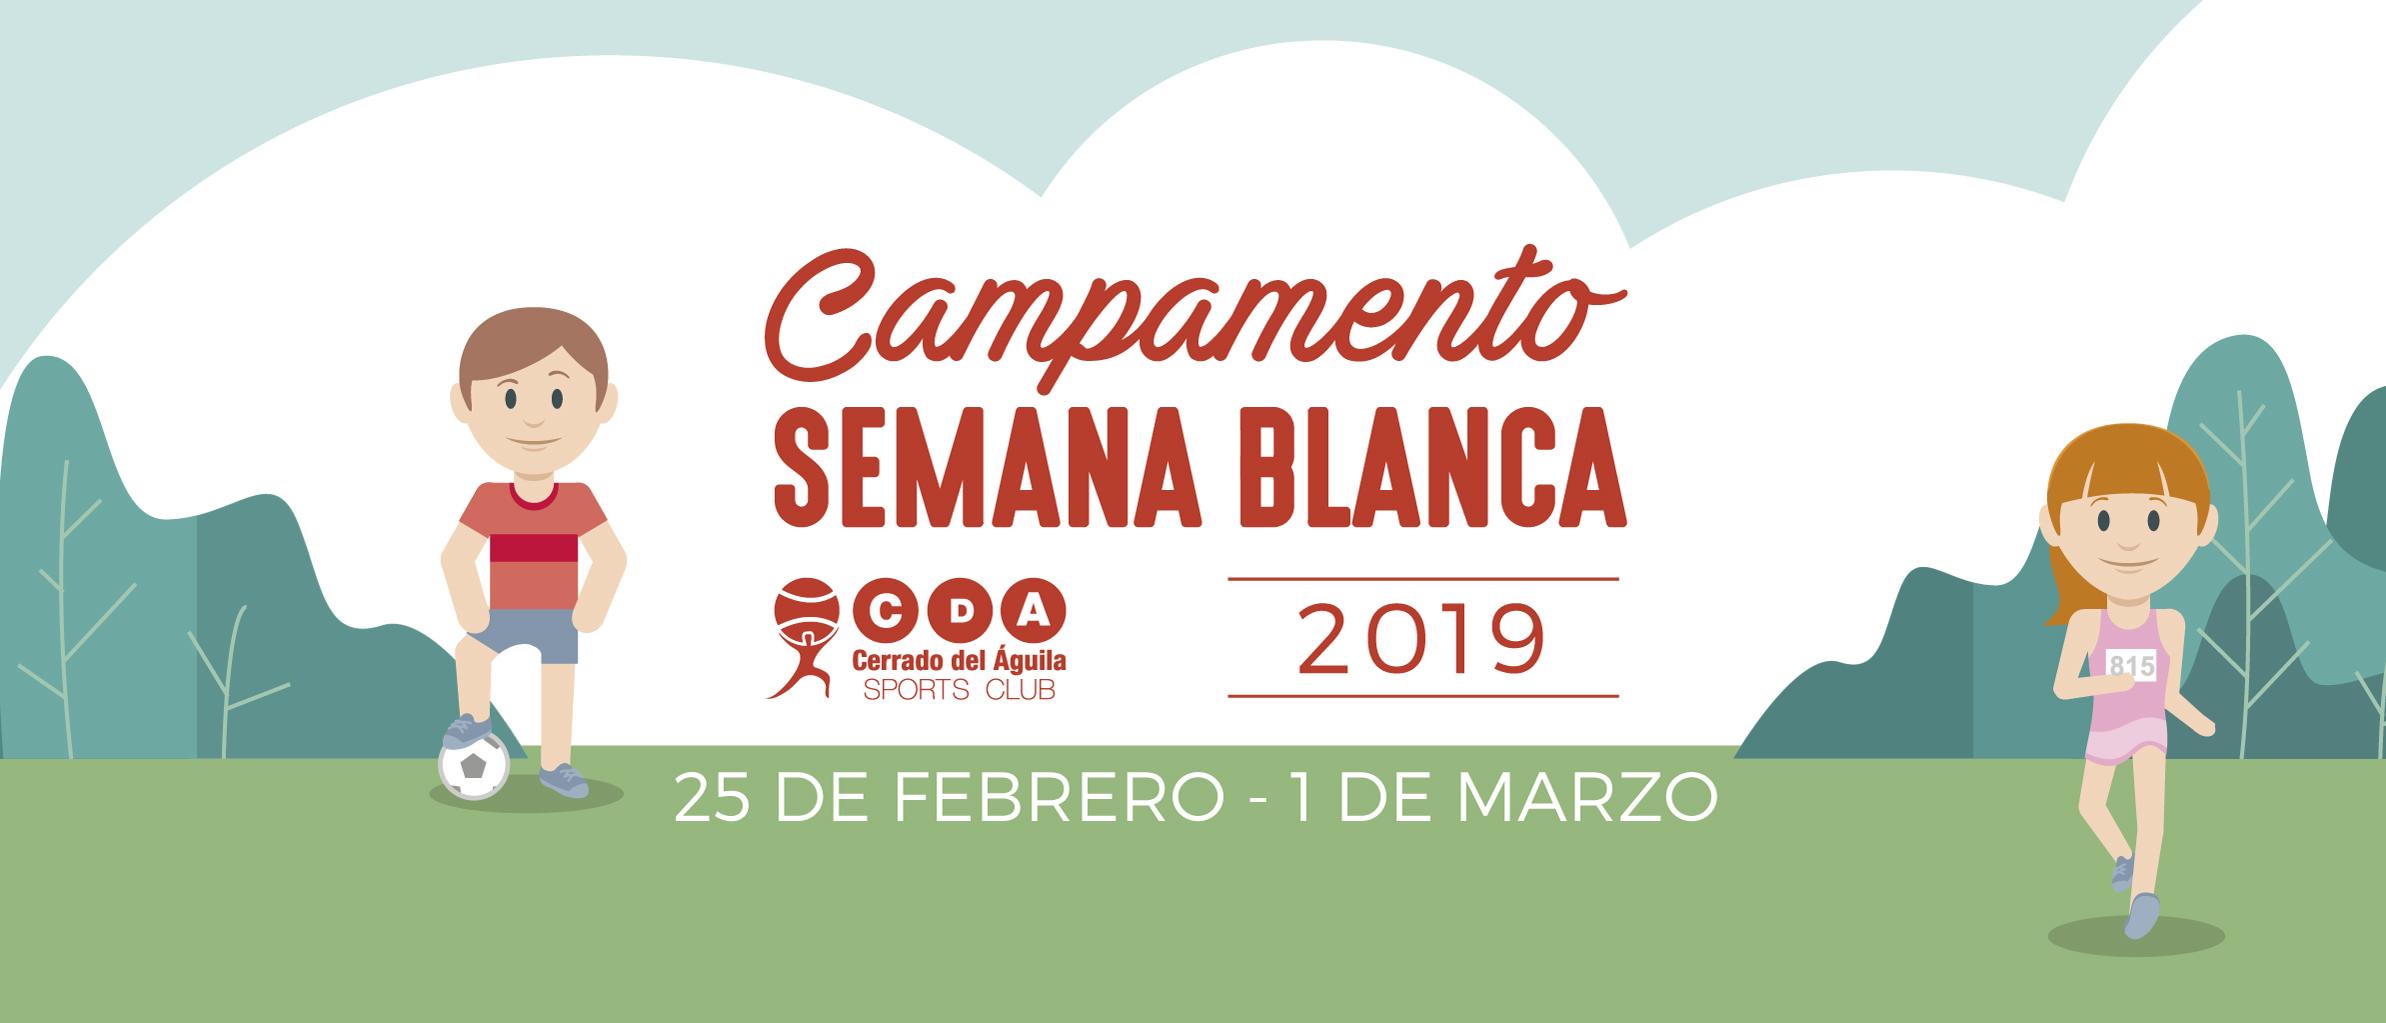 CDA-Campamento-Semana-Blanca-2019-mijas costa